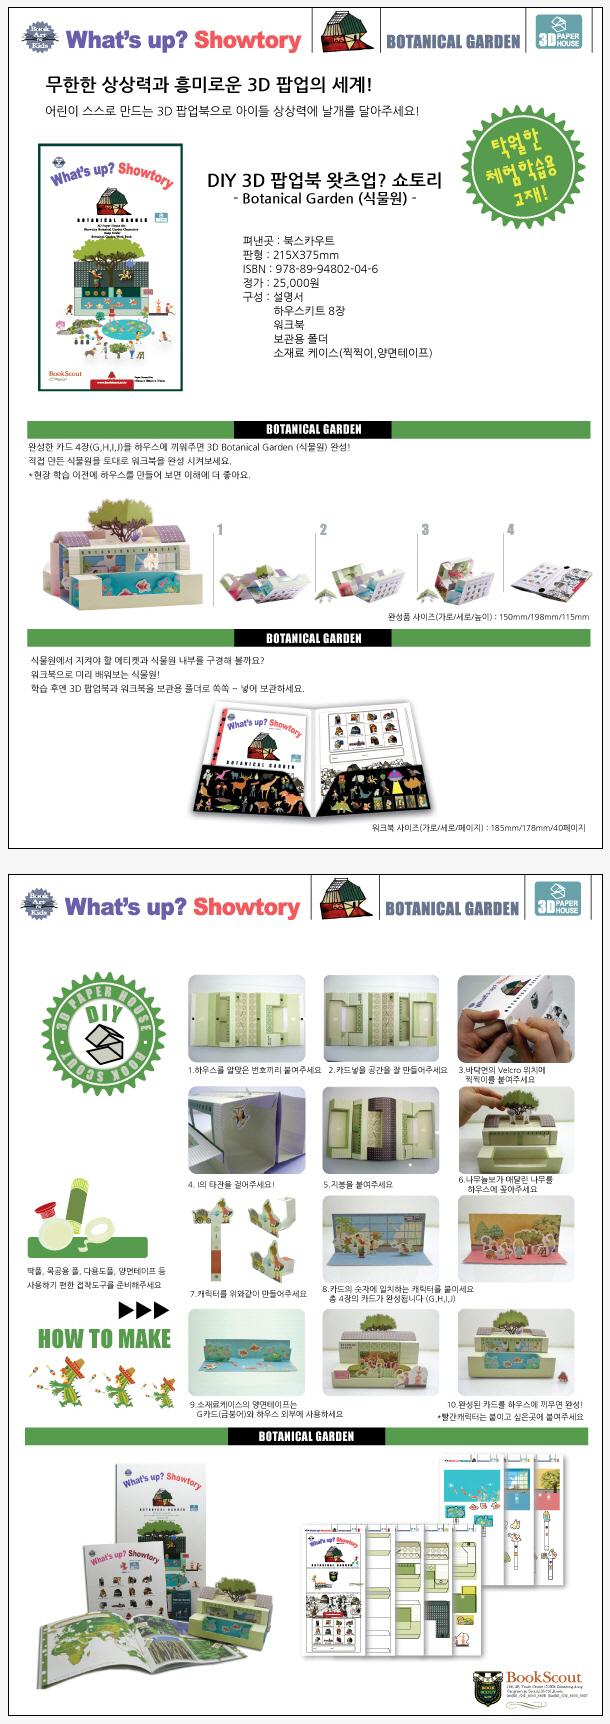 WHATS UP SHOWTORY: BOTANICAL GARDEN(왓츠업 쇼토리: 식물원)(3D팝업북)(팝업북) 도서 상세이미지